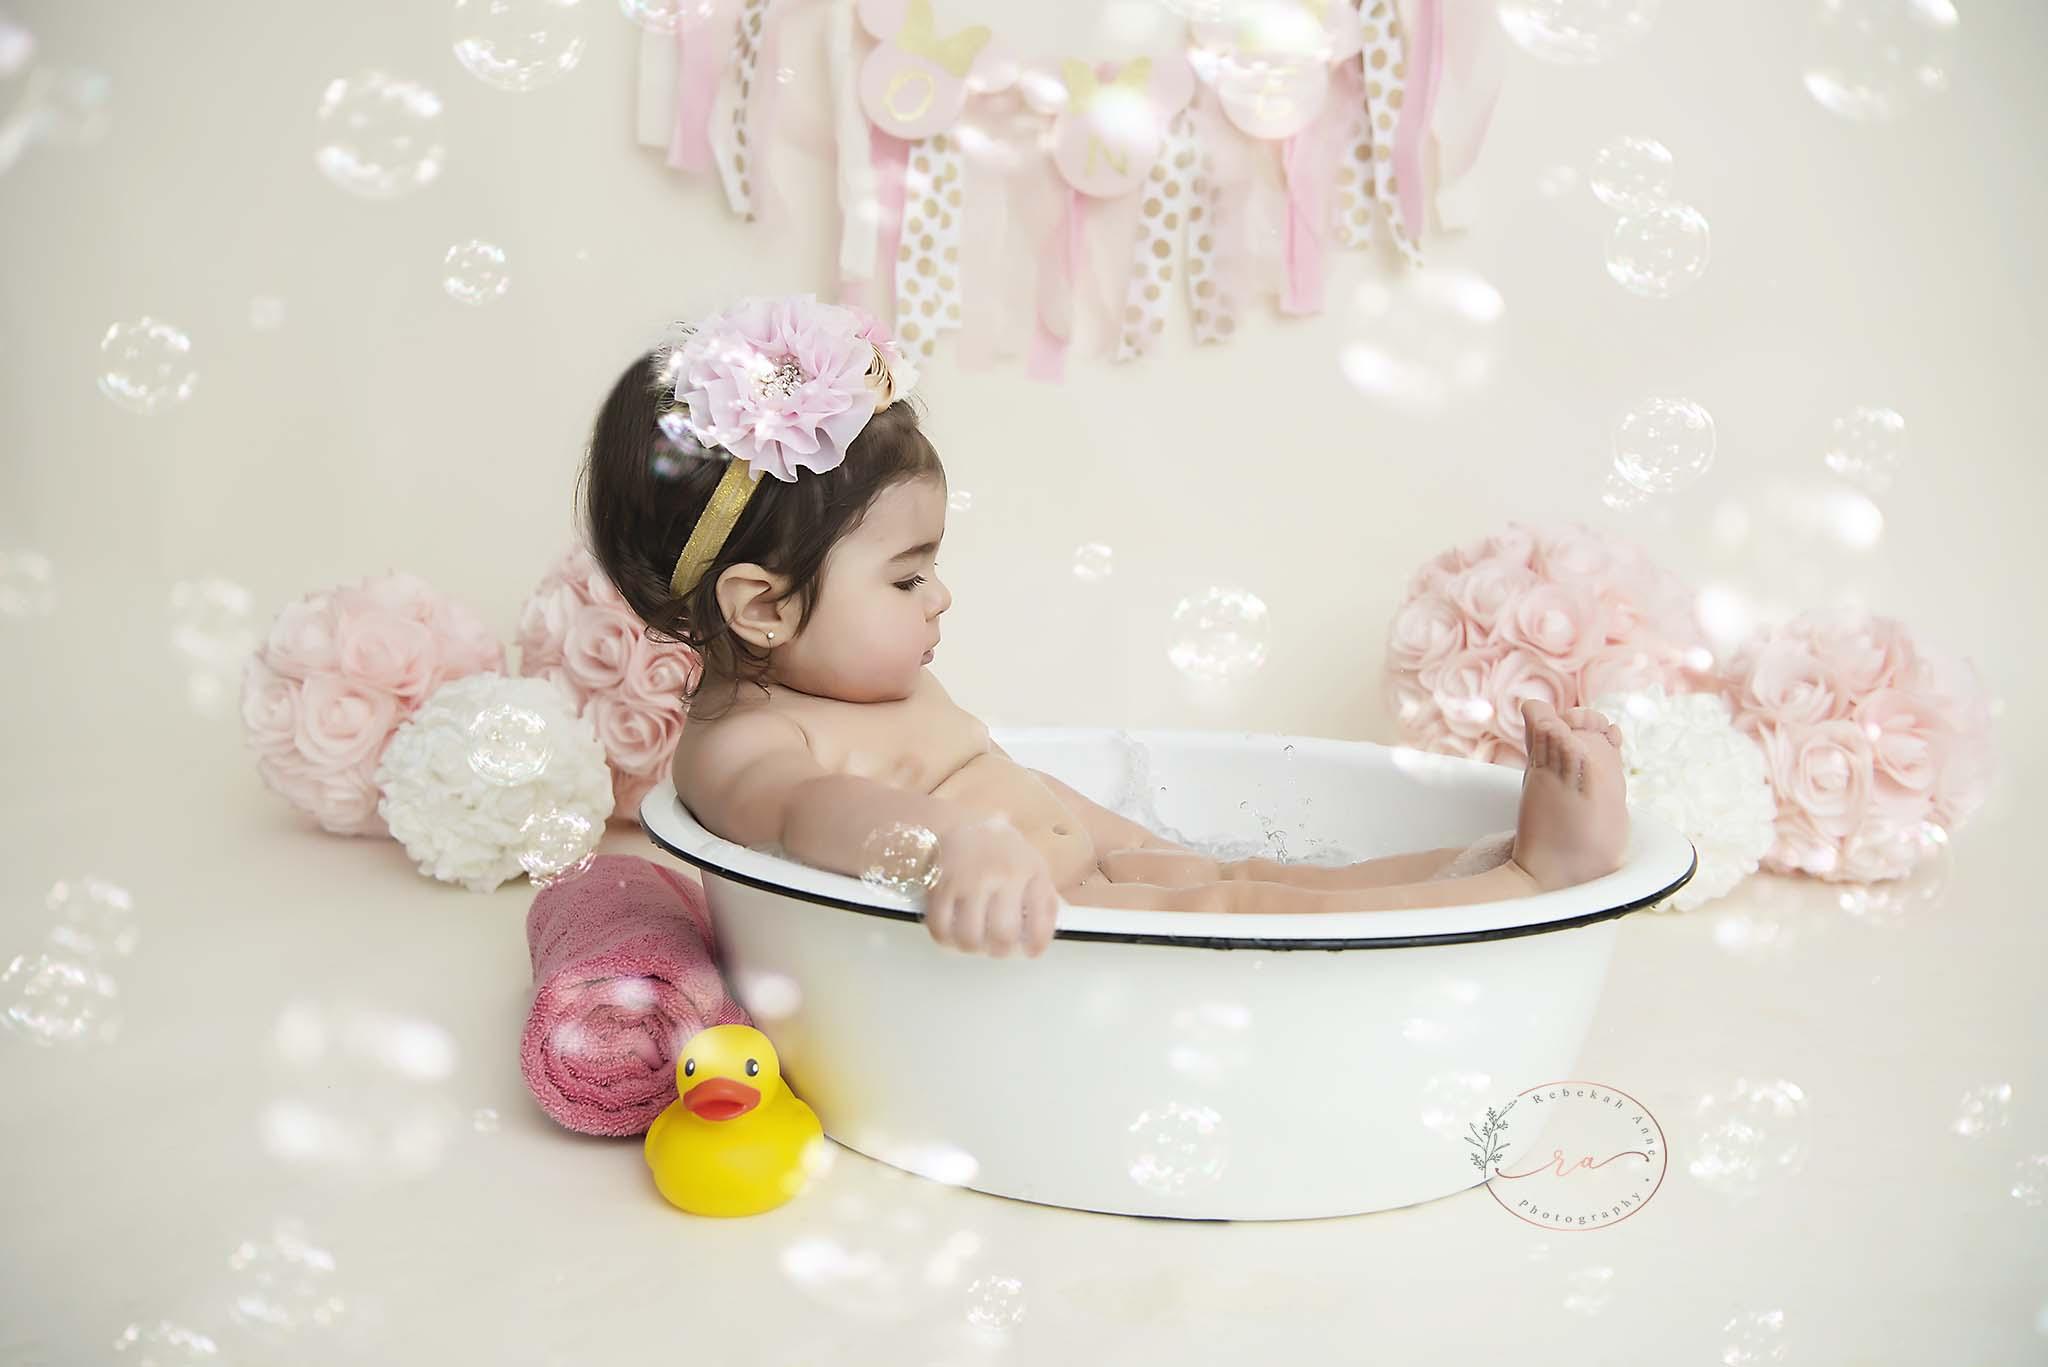 Adrianna_3913bubbles.jpg